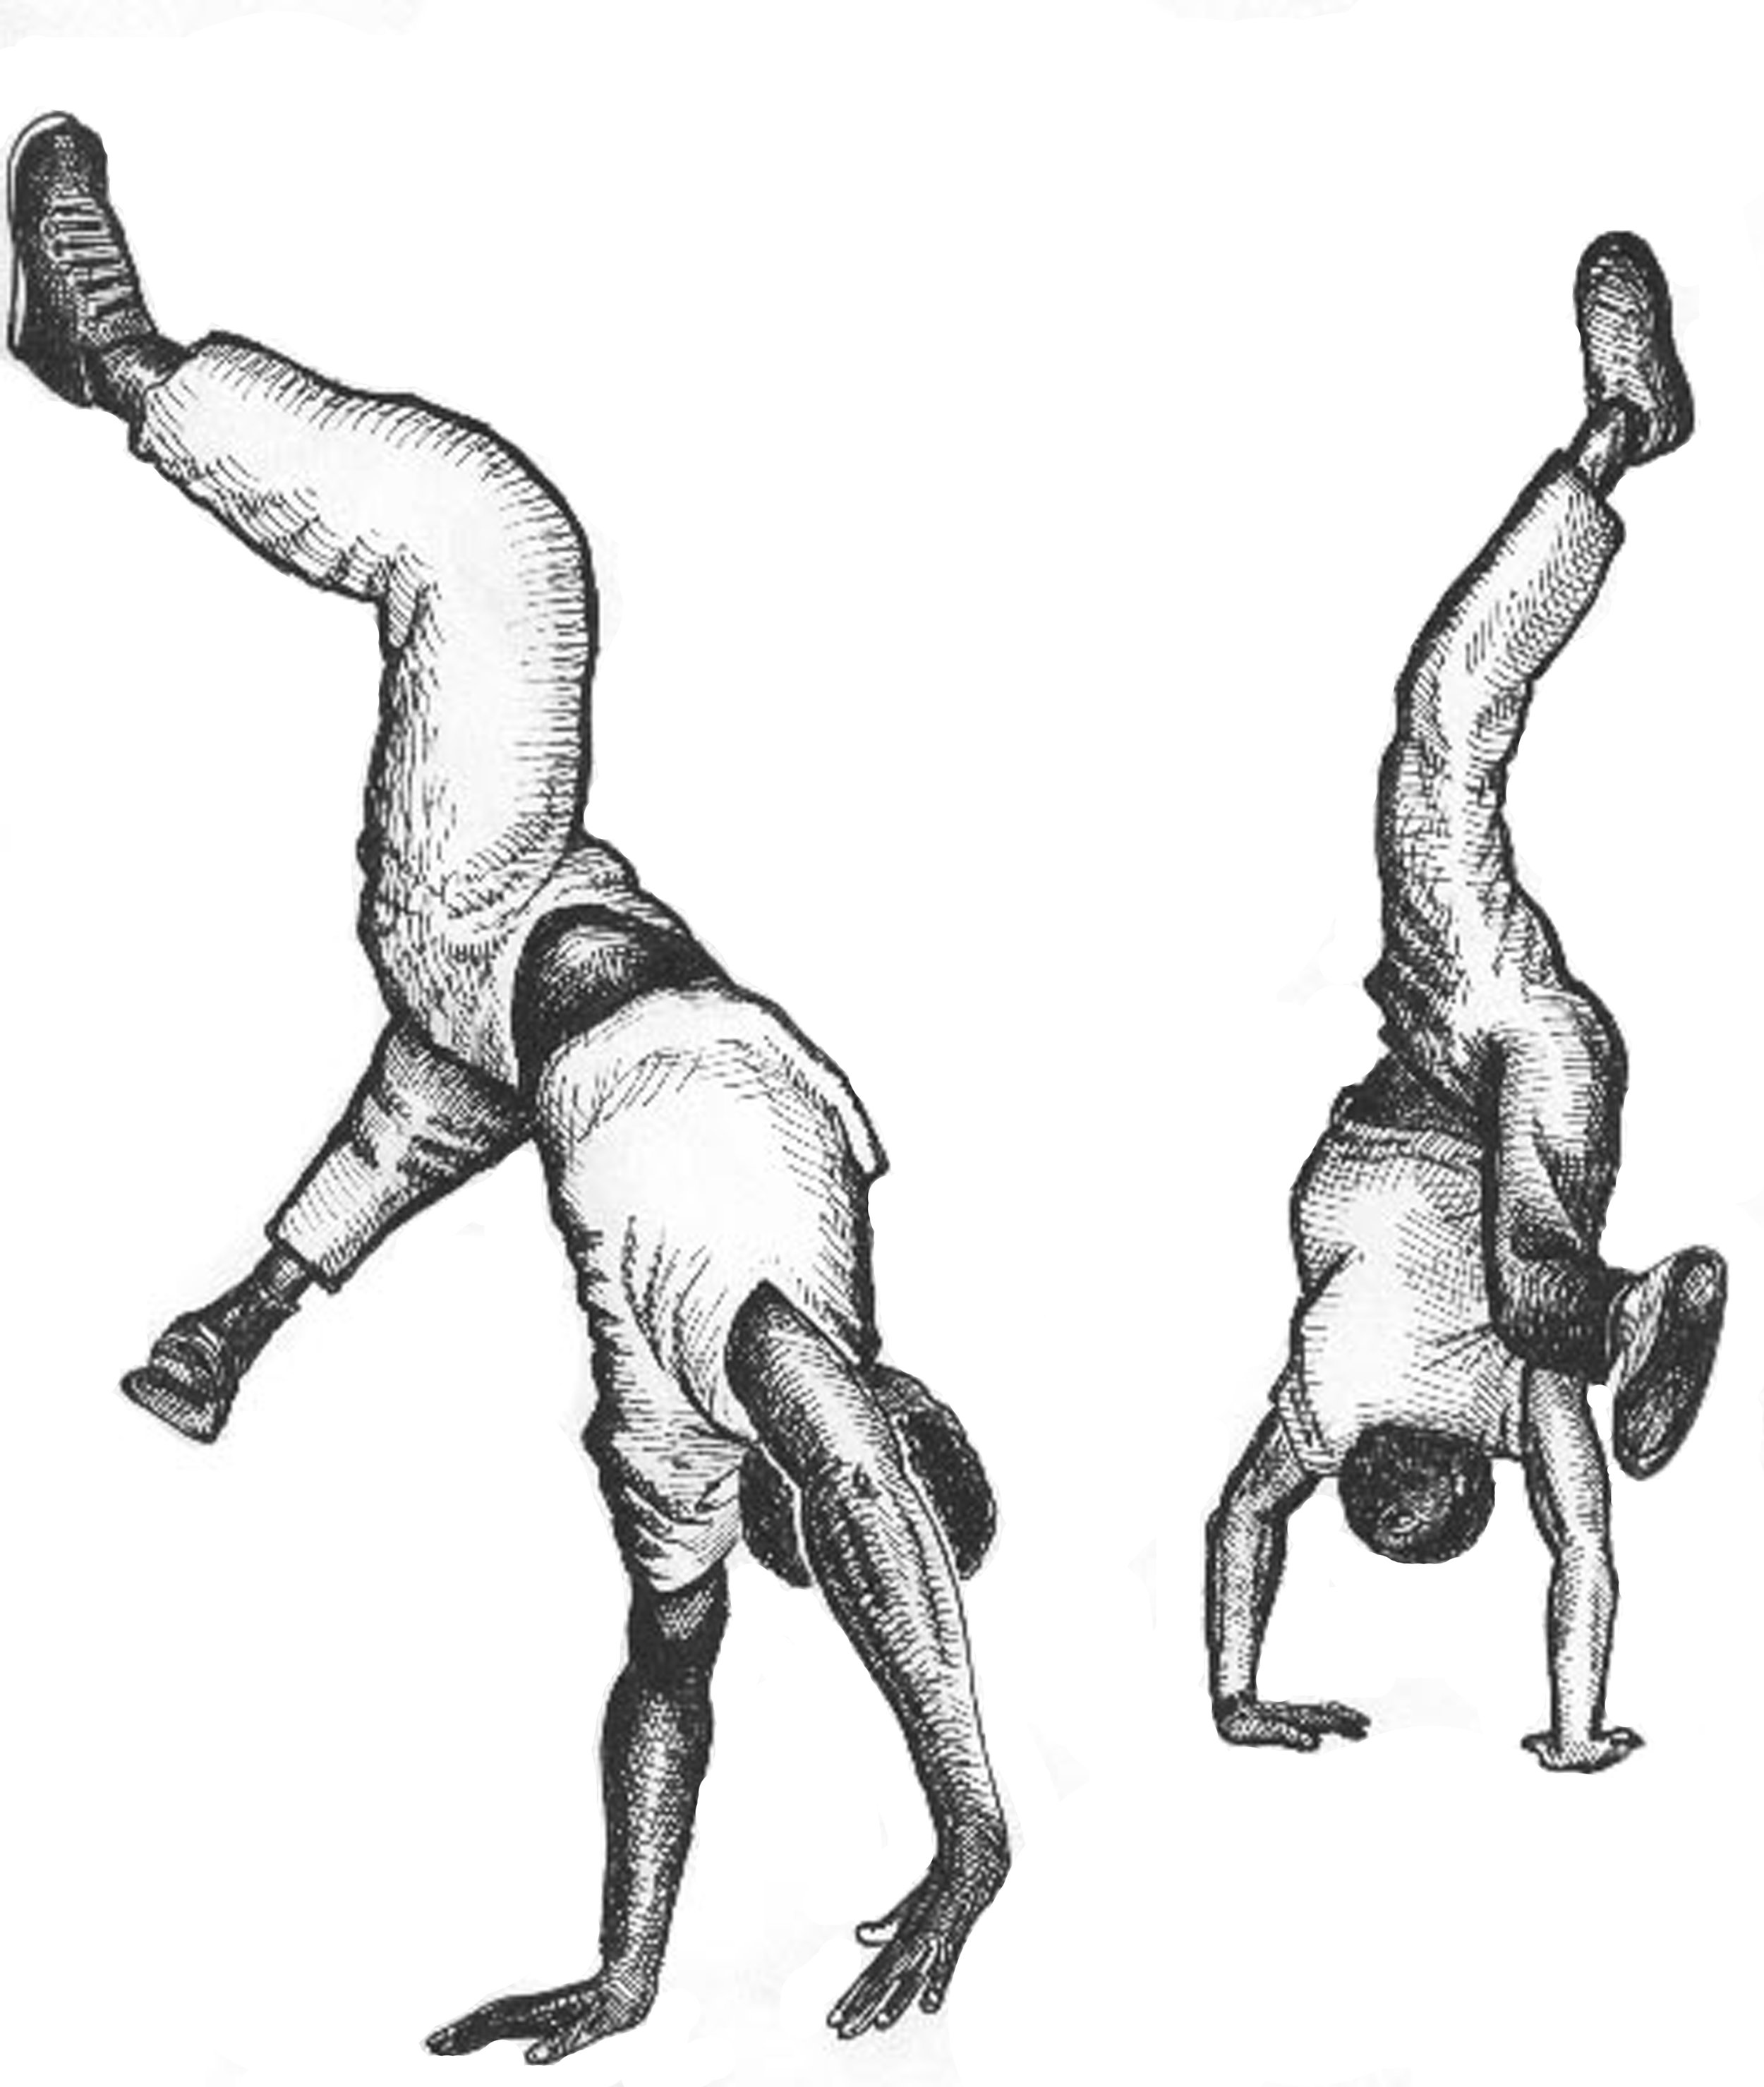 2 Capoeira figures drawing.jpg